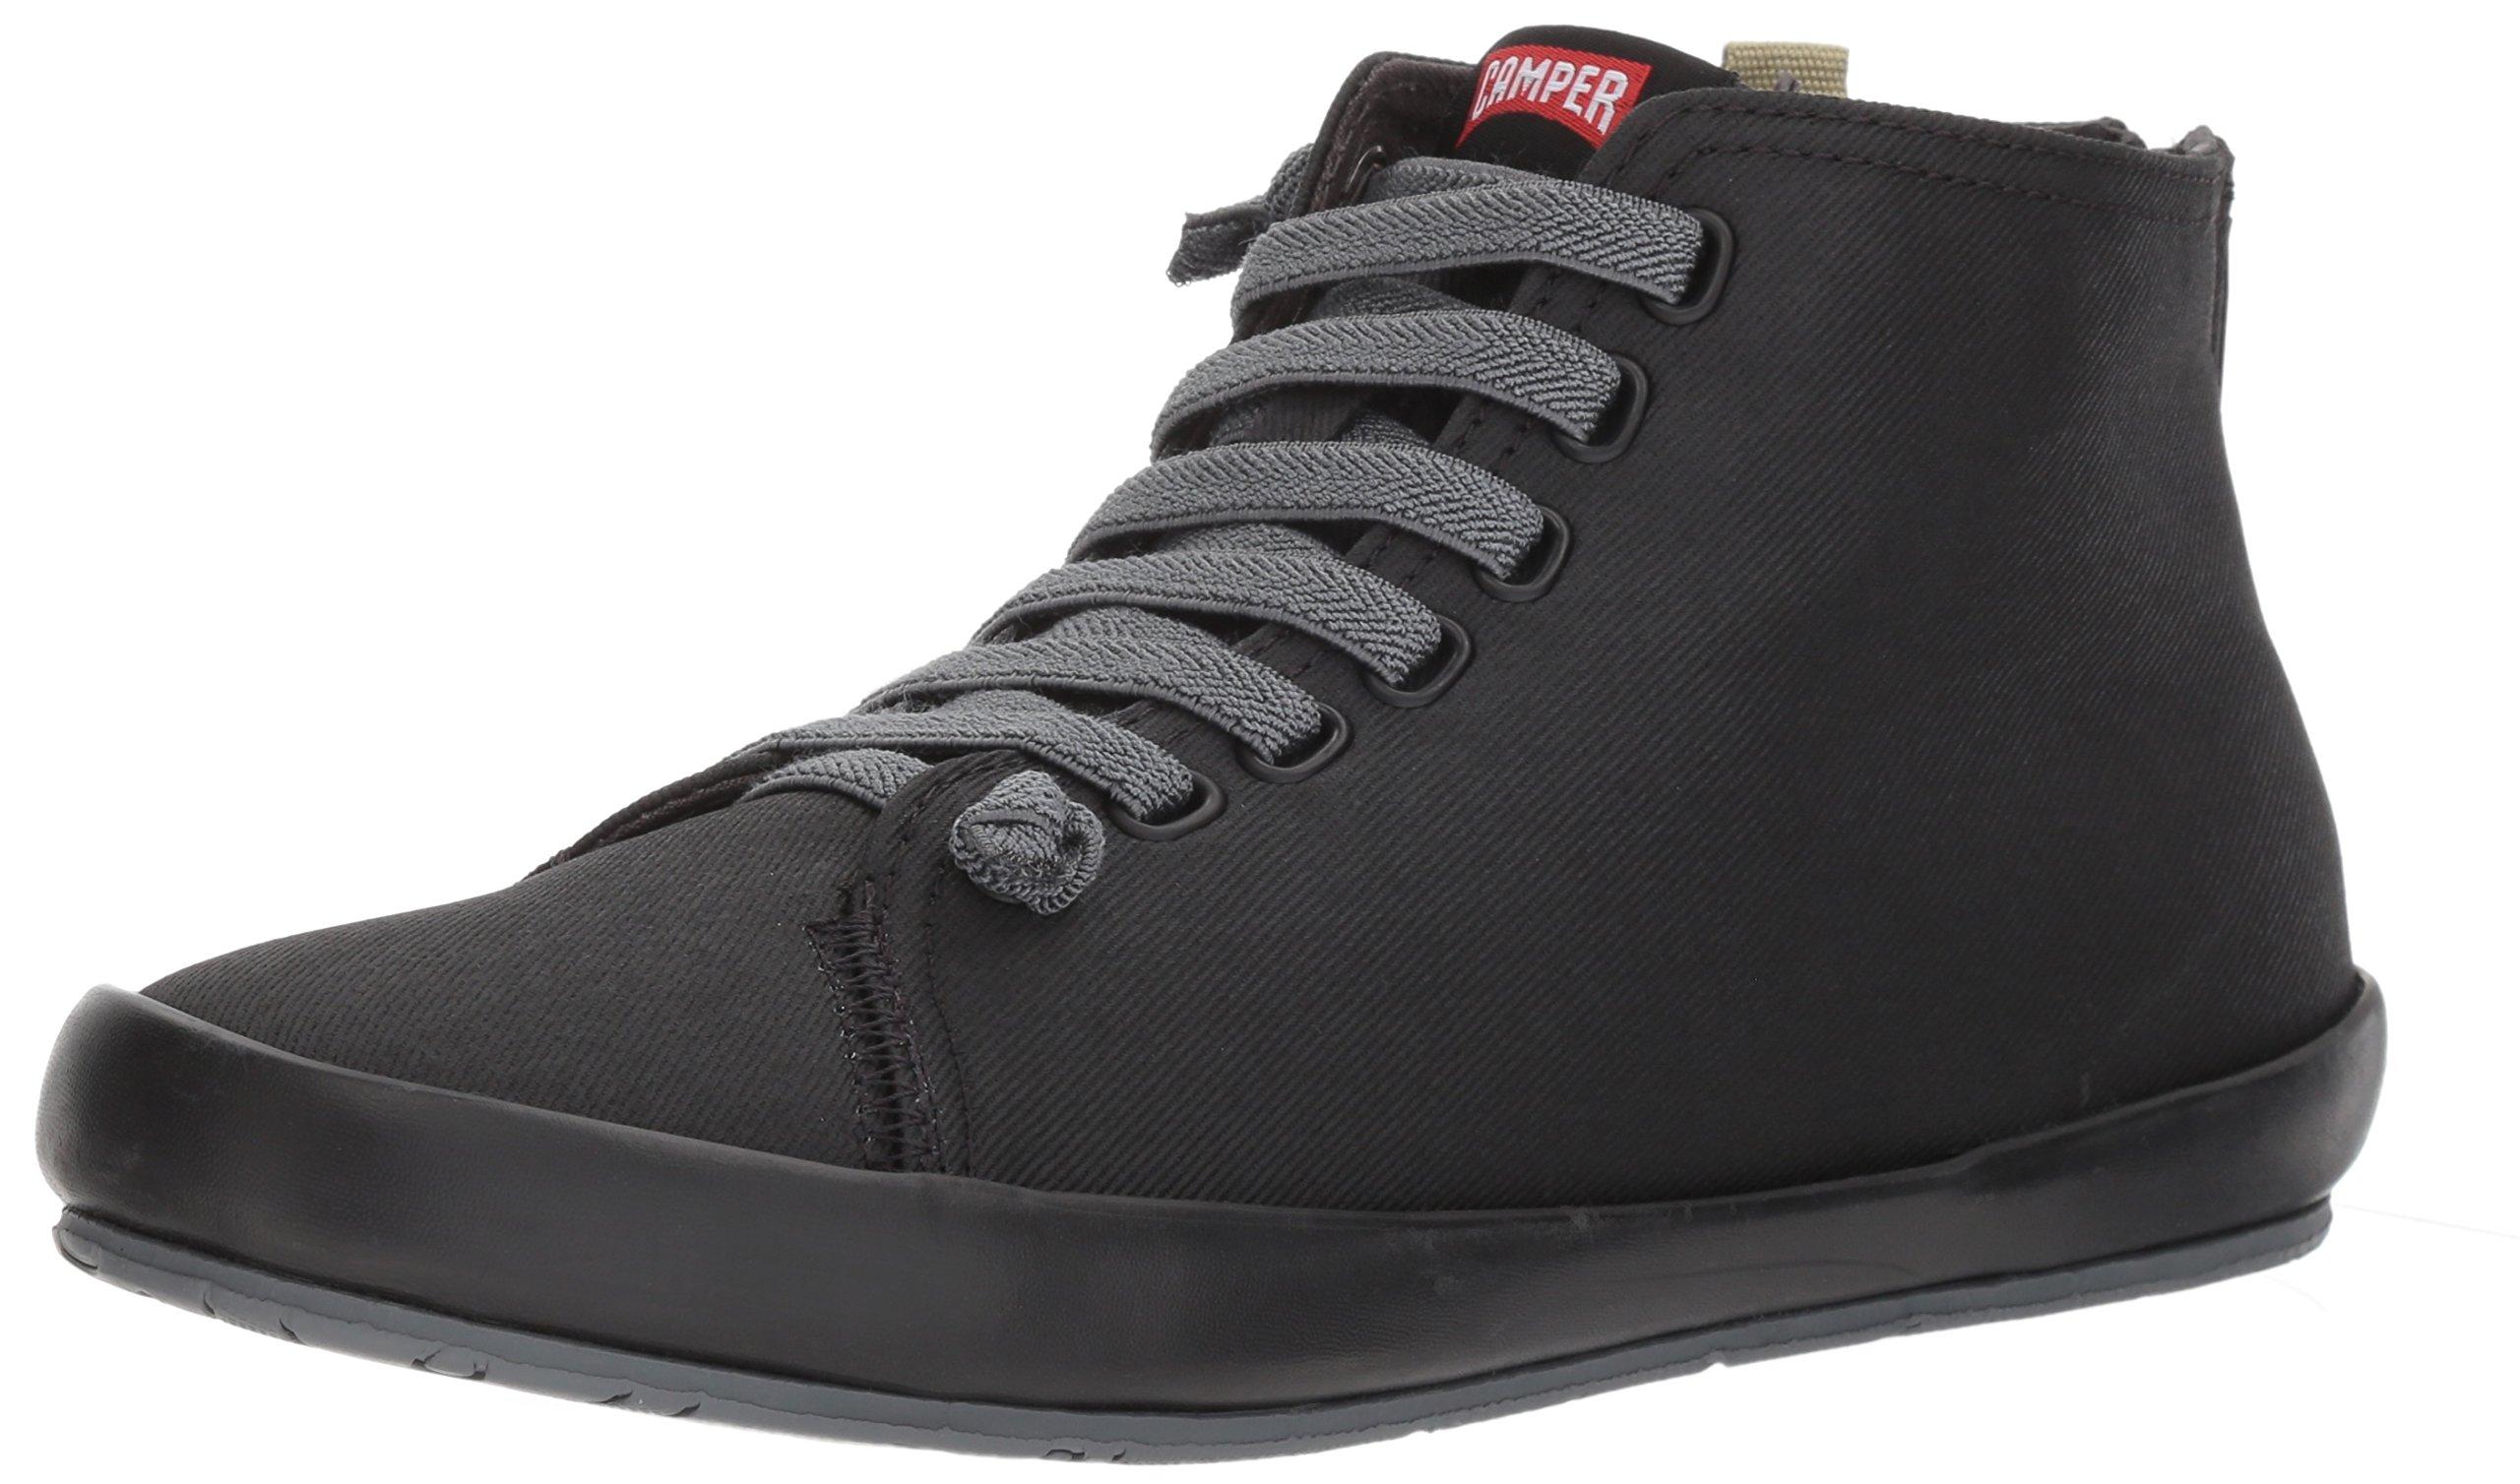 Camper Women's Borne K400163 Fashion Sneaker, Black, 38 EU/8 M US